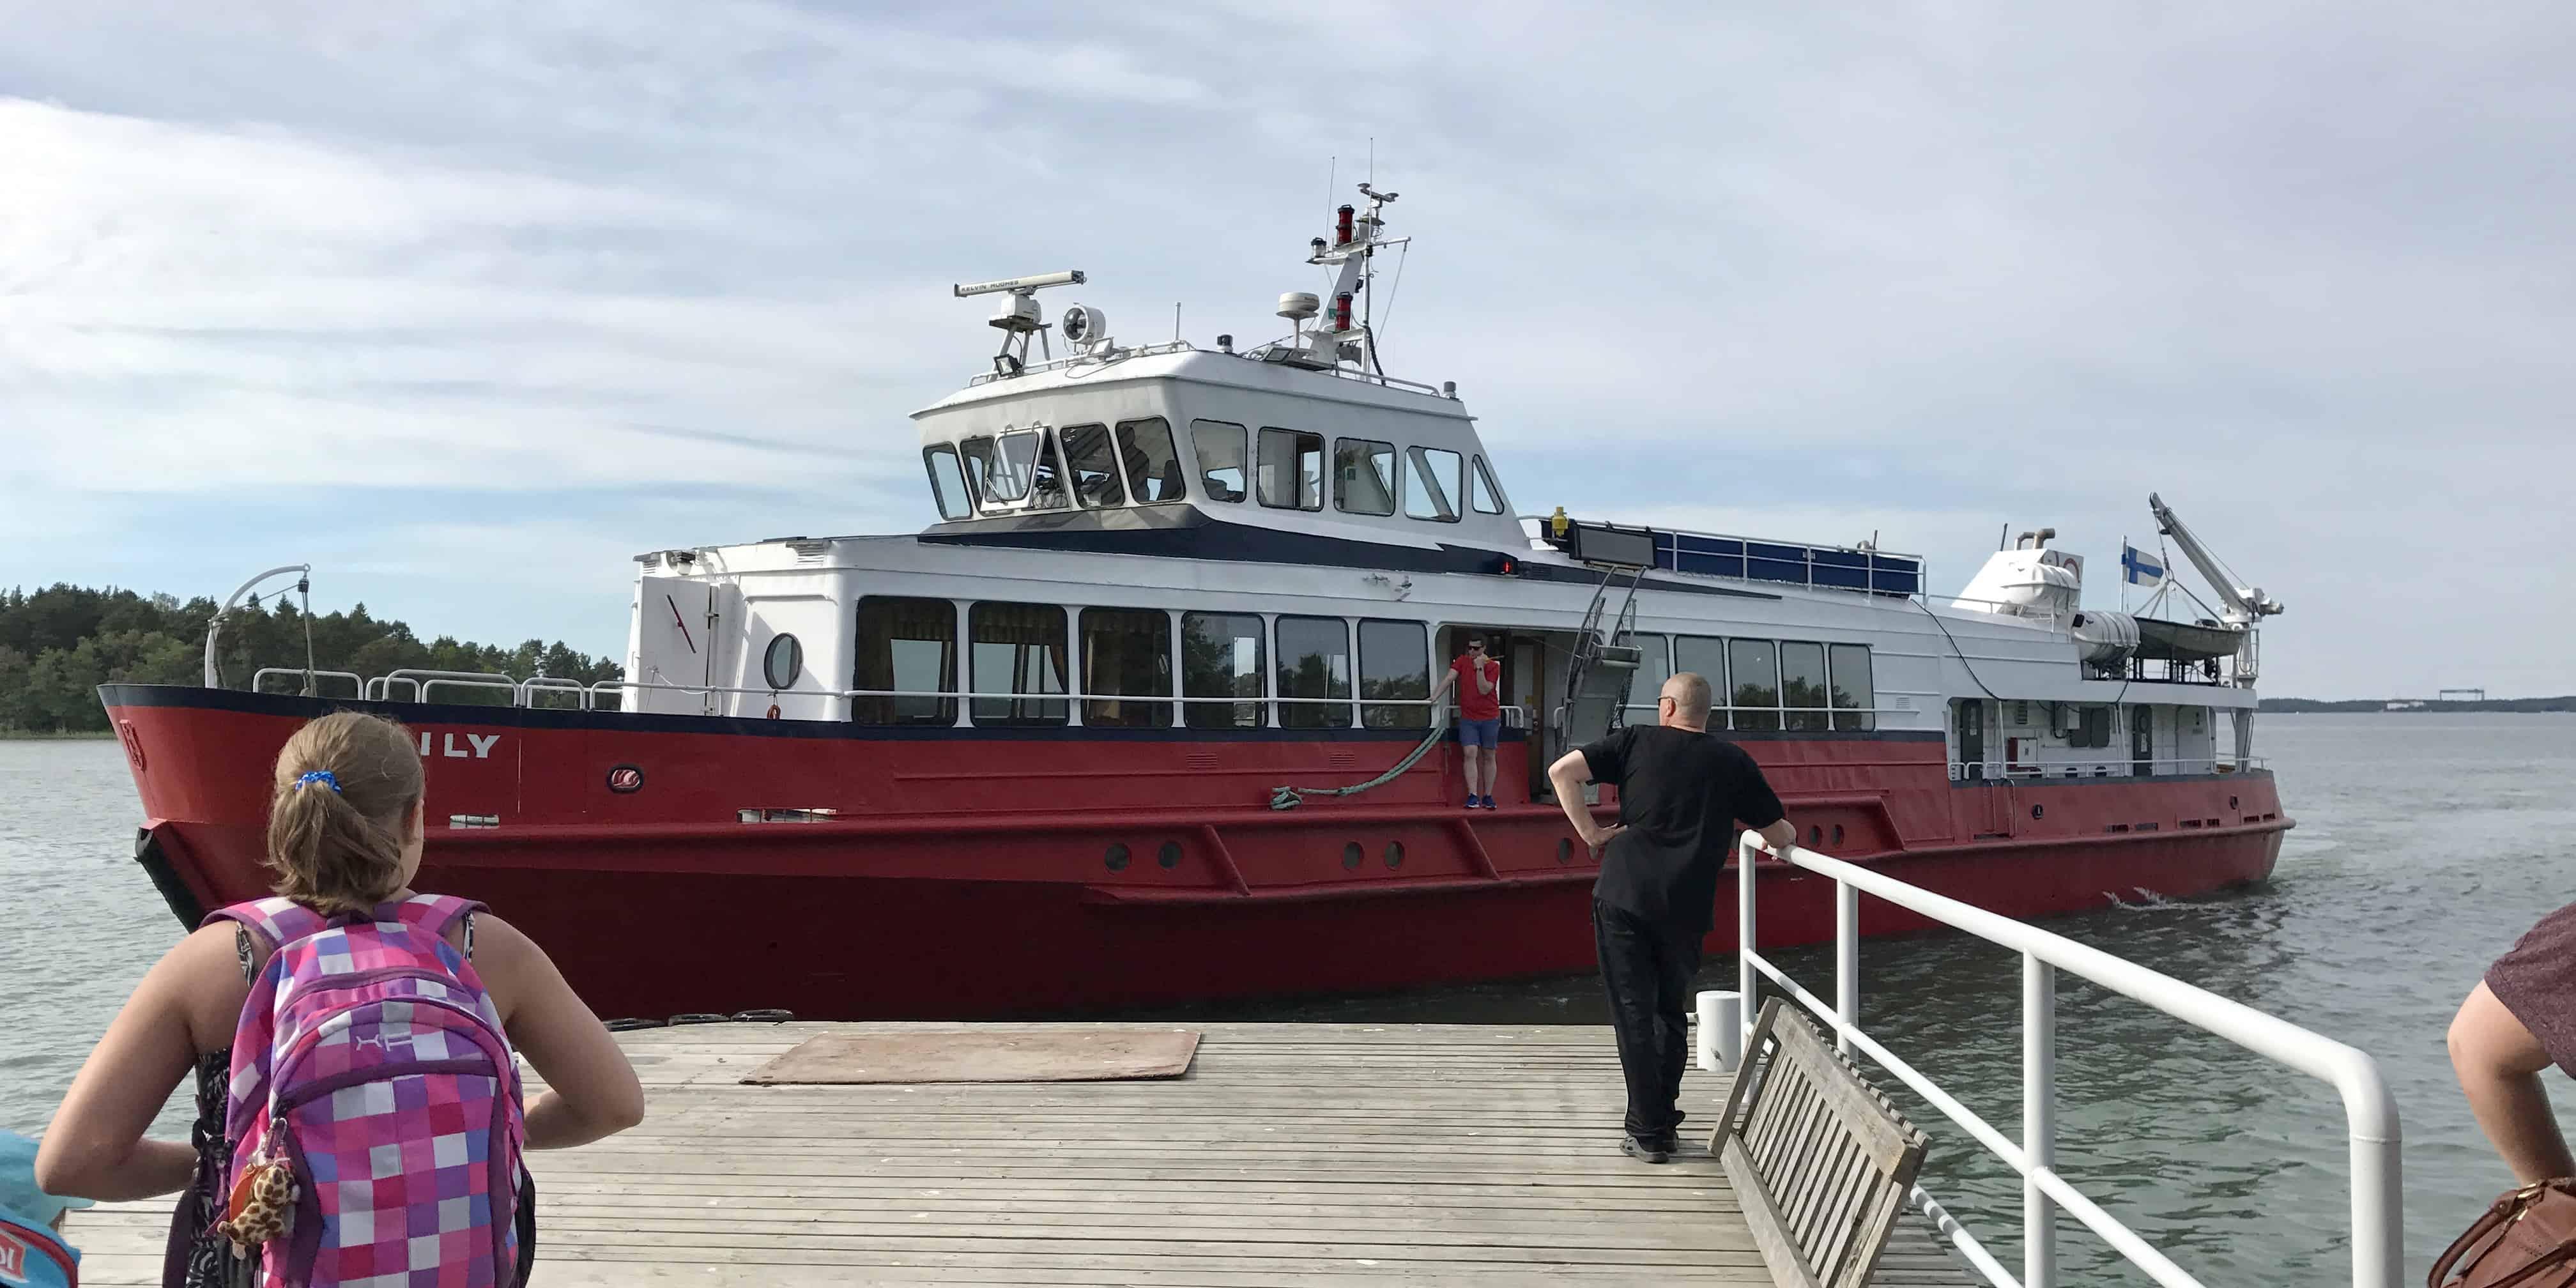 Ferry betternotstop Vepsa Finland Turku